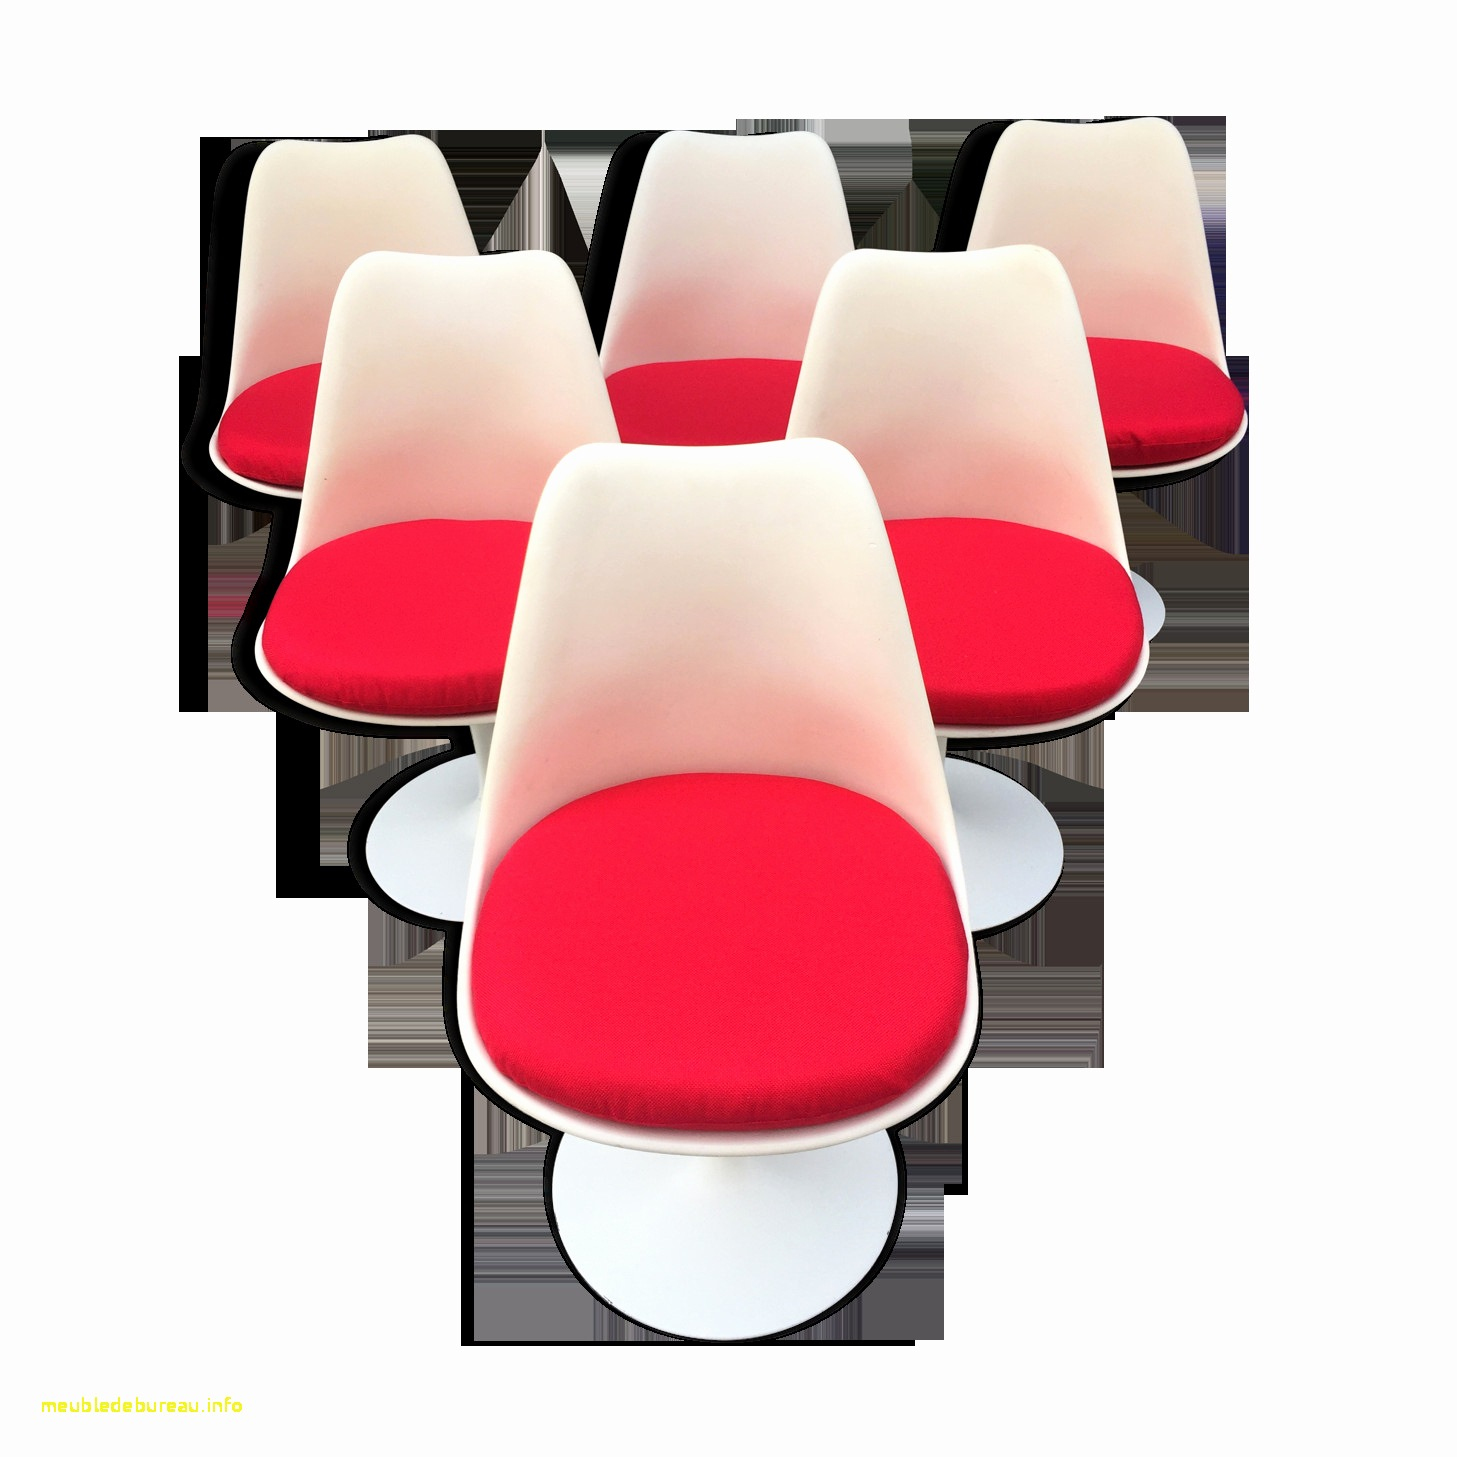 Cheval En Bois Ikea Luxe Galerie Chaise De Bureau En Bois Best Kawaii En Bois Cheval Chaise